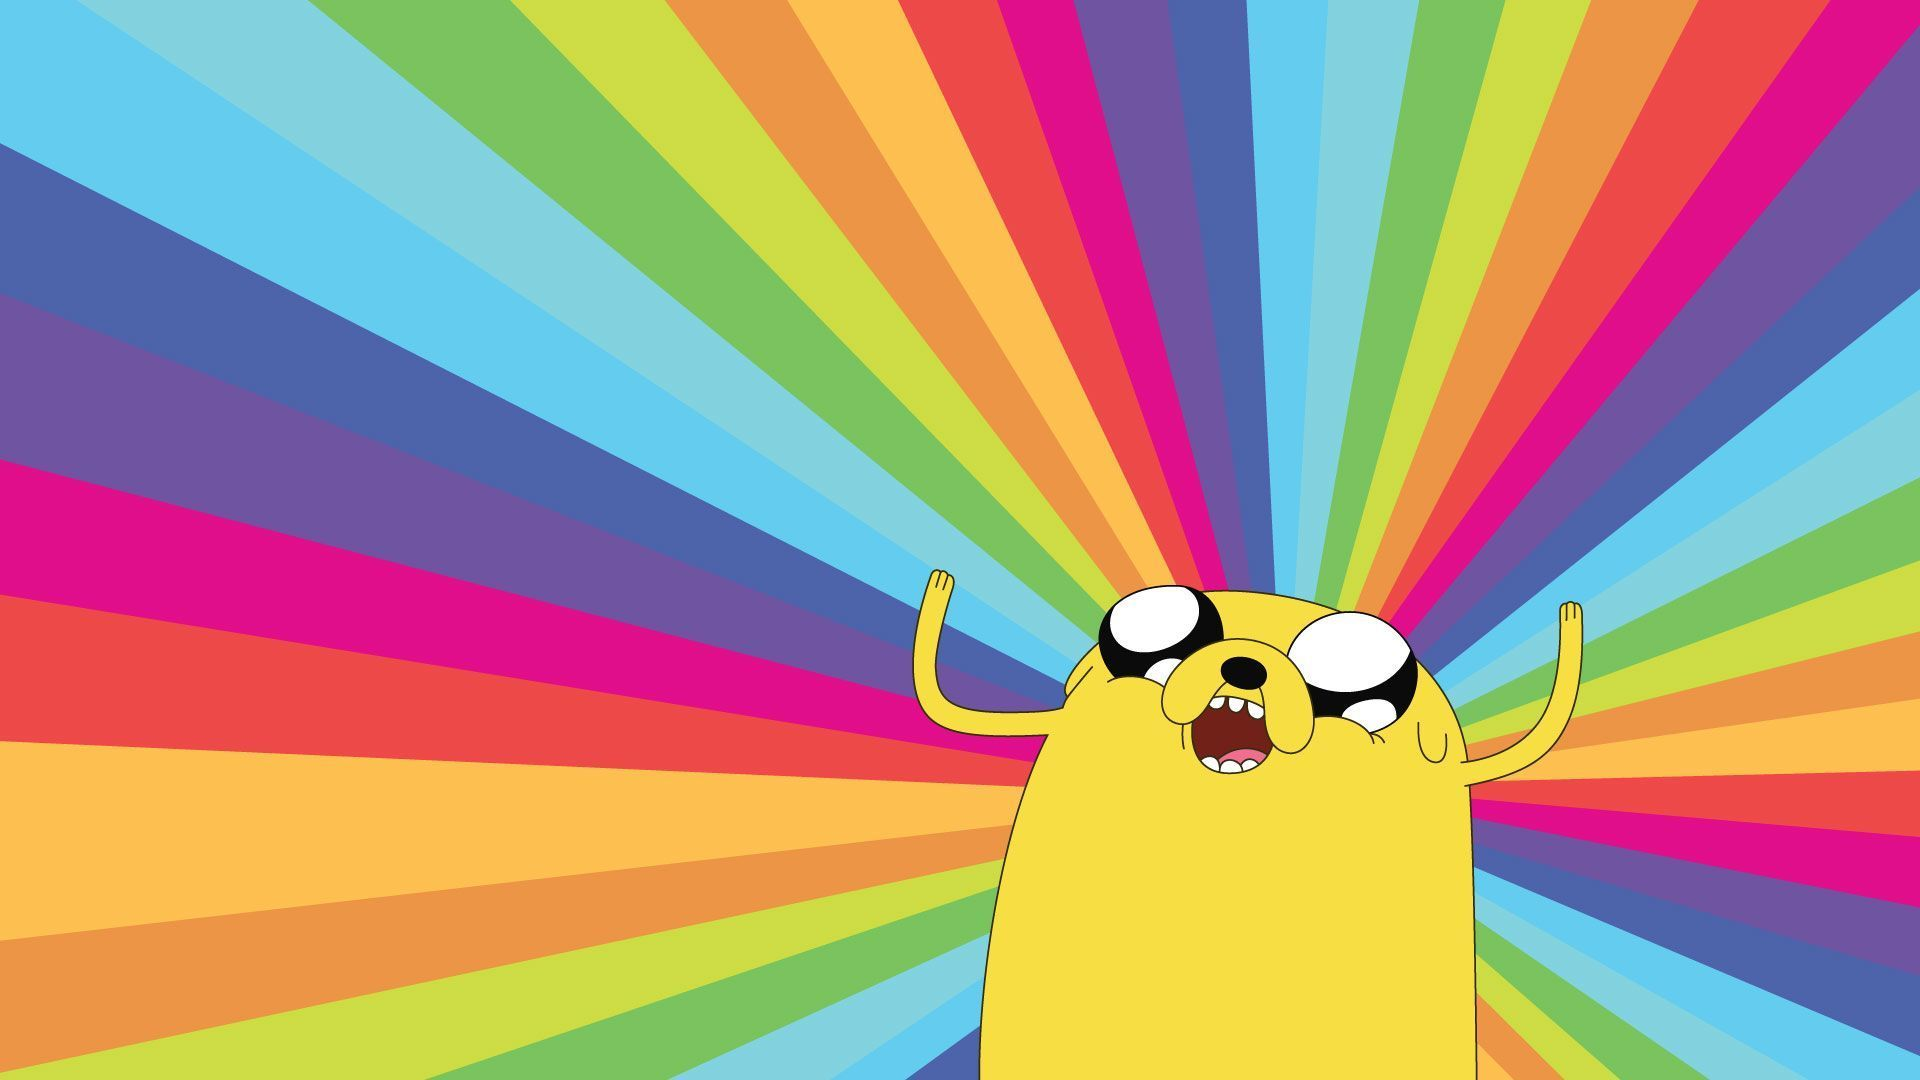 Adventure Time Wallpaper iPhone HD Best Wallpaper HD